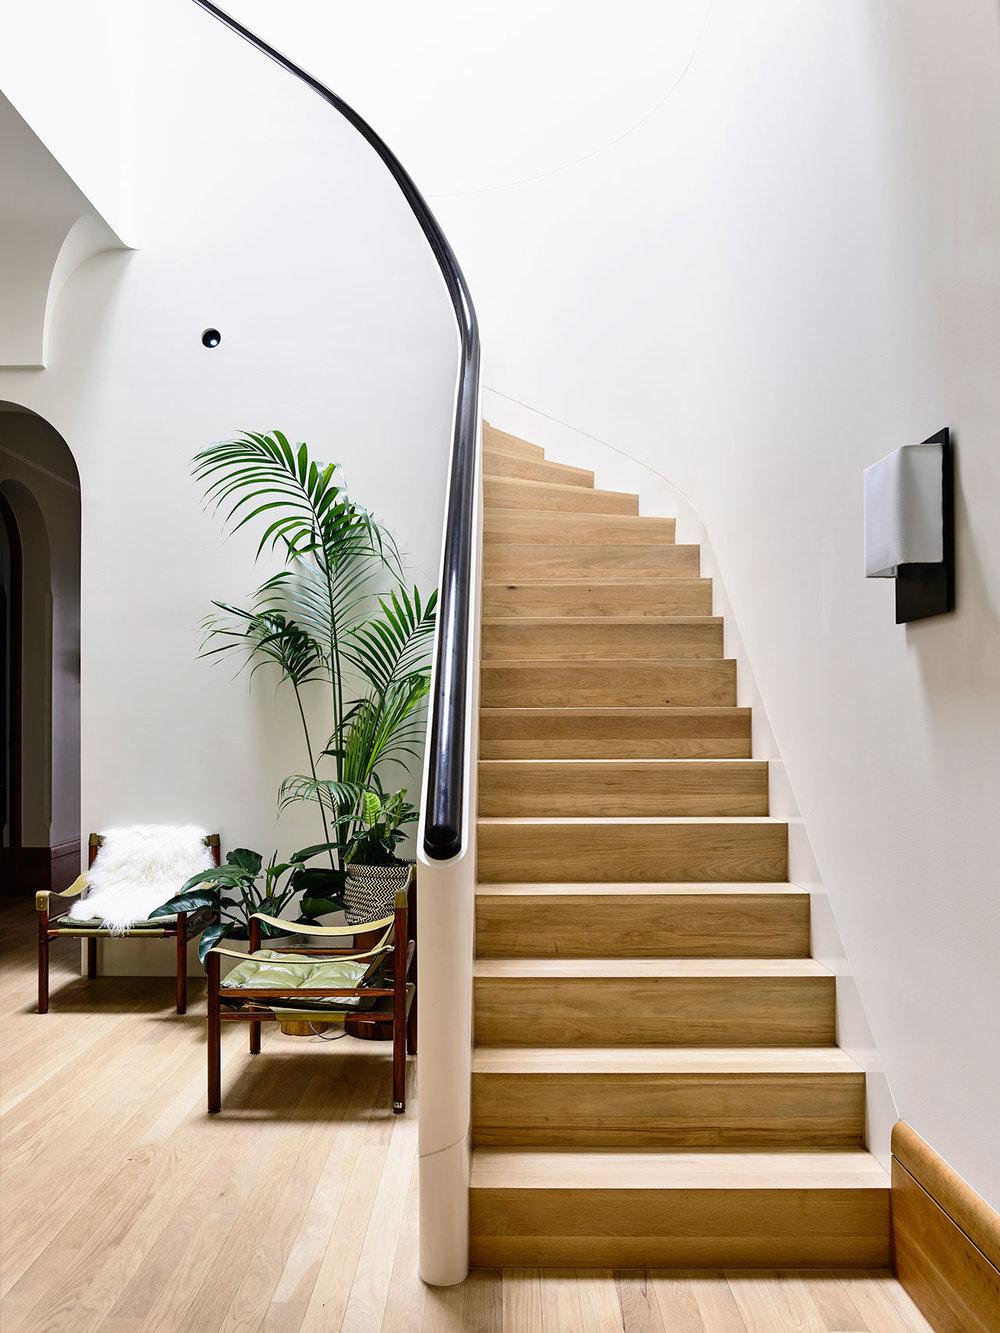 s5_st_vincent_s_place_residence_albert_park_australia_b_e_architecture_yatzer.jpg